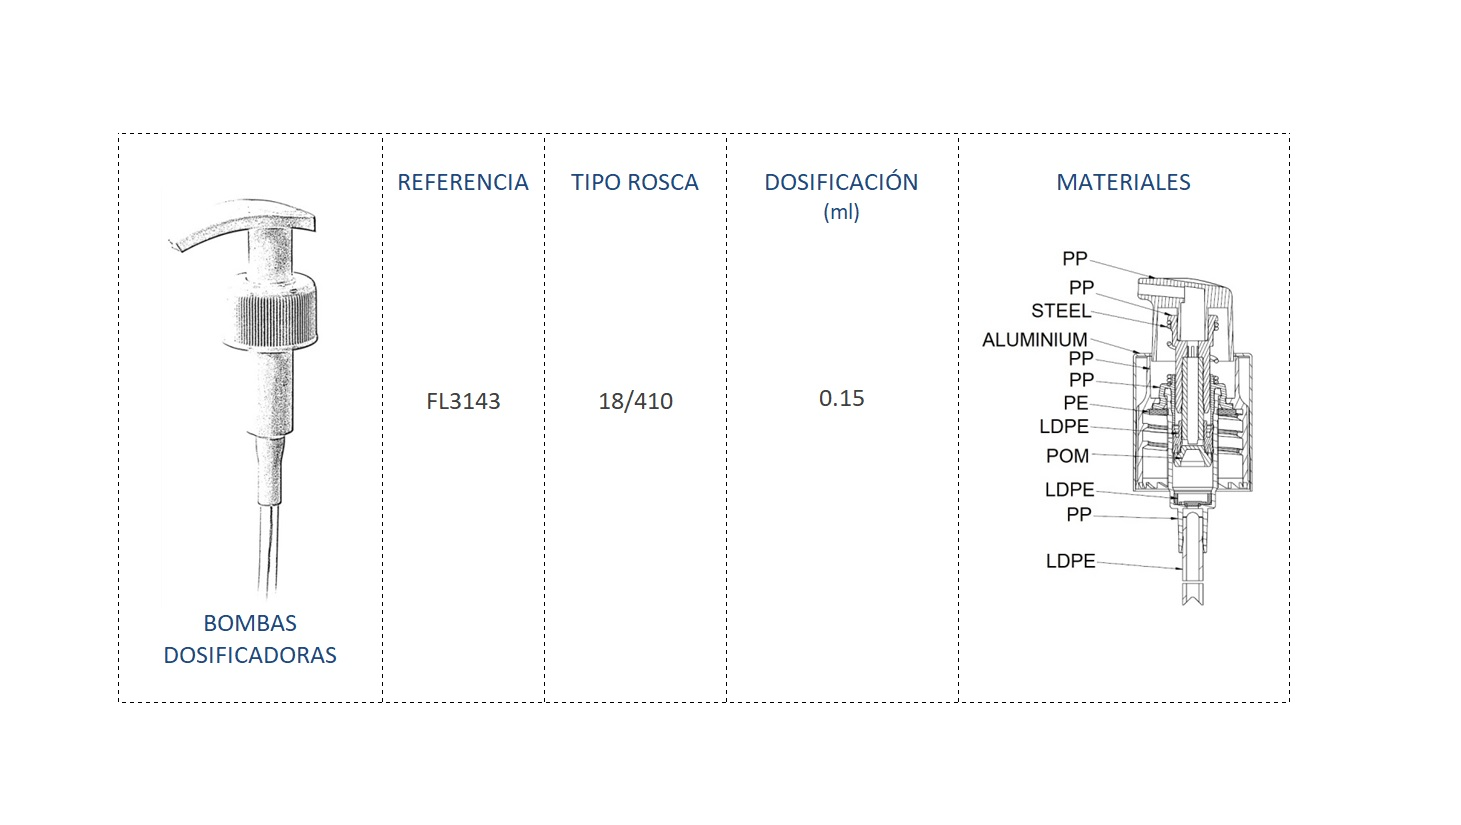 Cuadro control bomba dosificadora FL3143 18/410